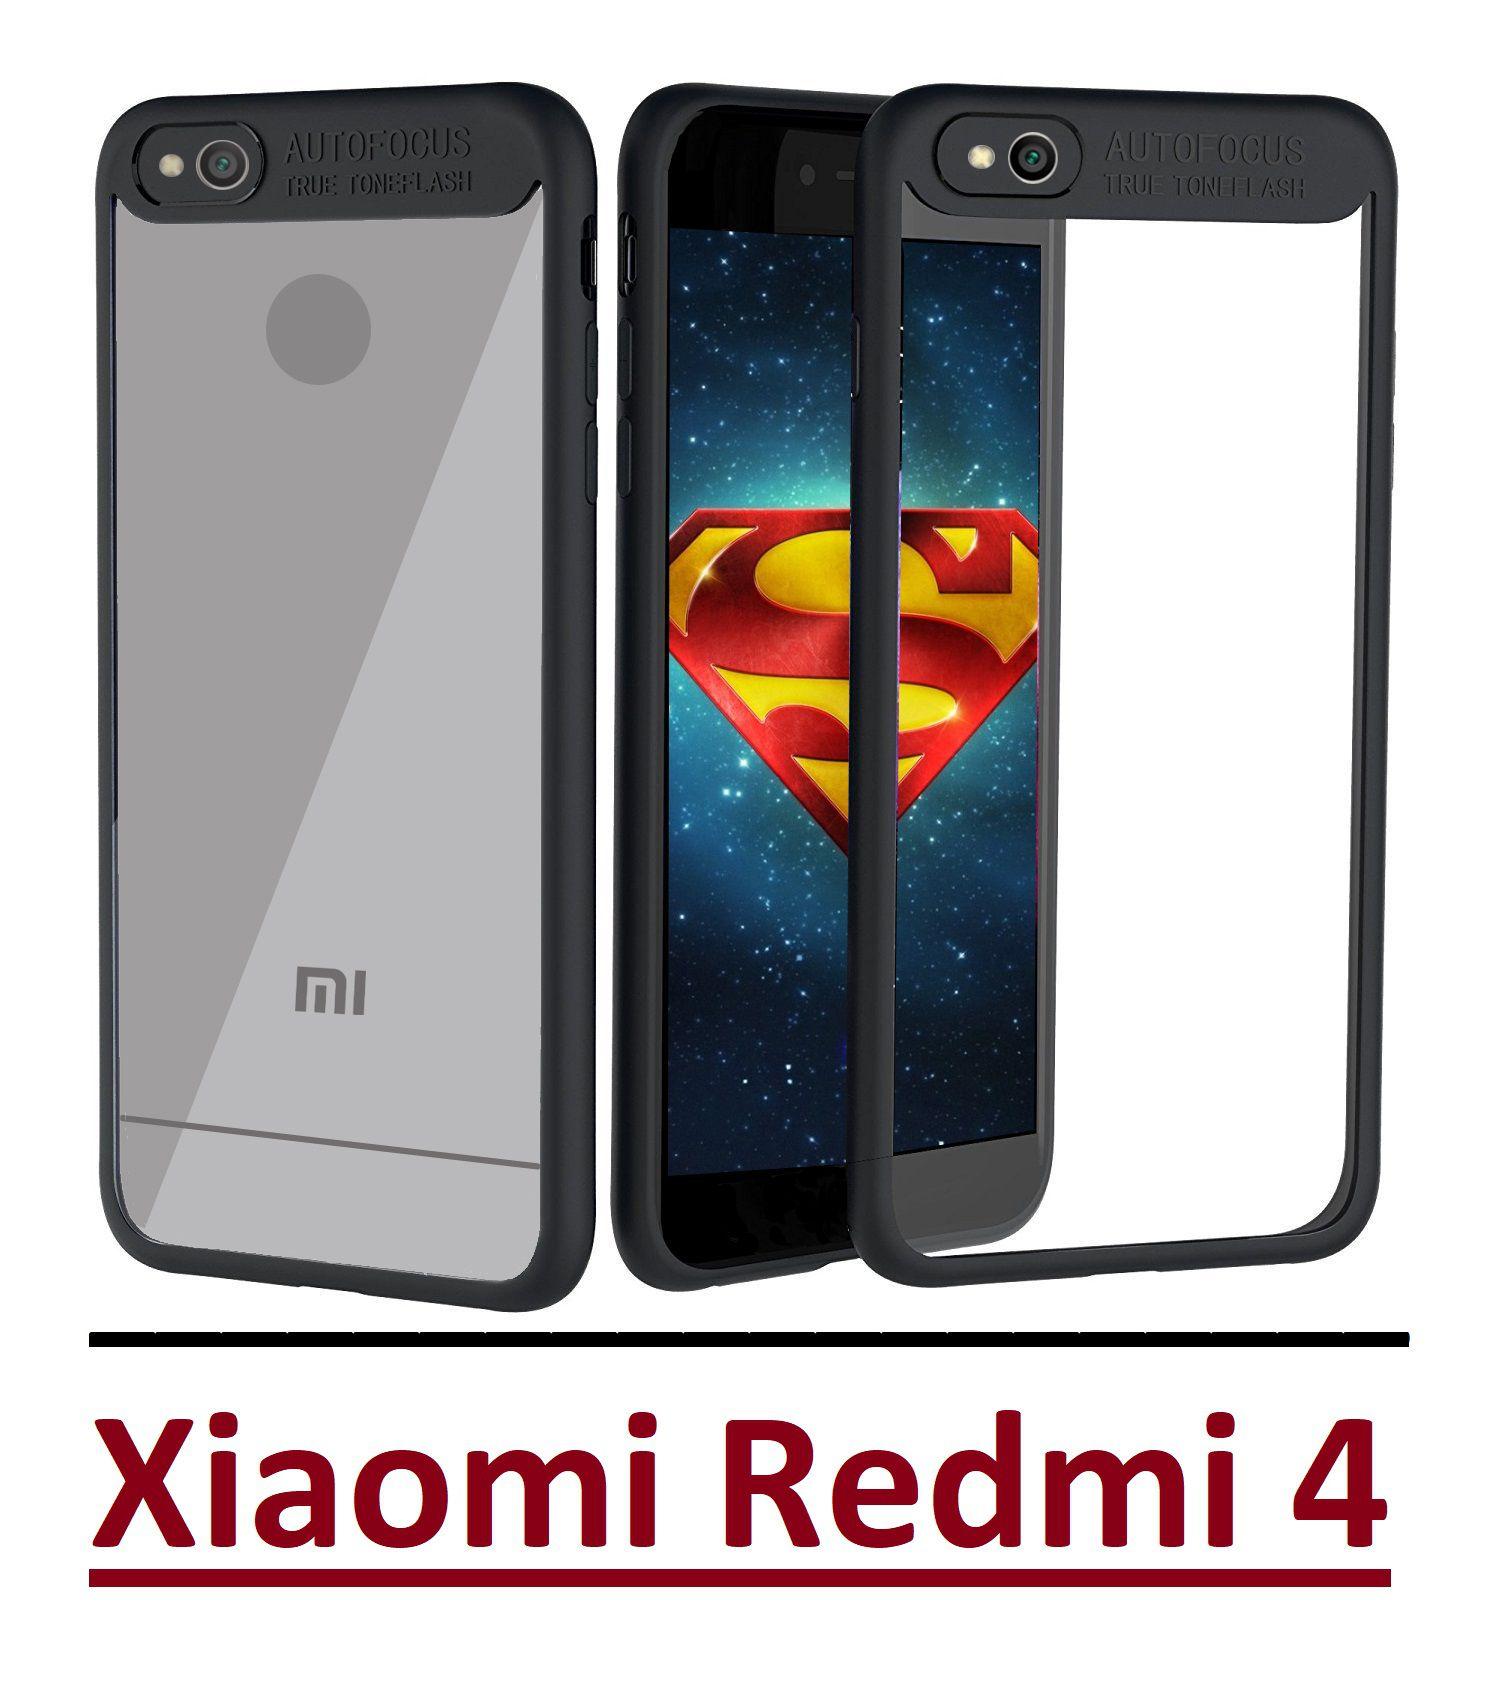 Xiaomi Redmi 4 Bumper Cases Ace HD Black